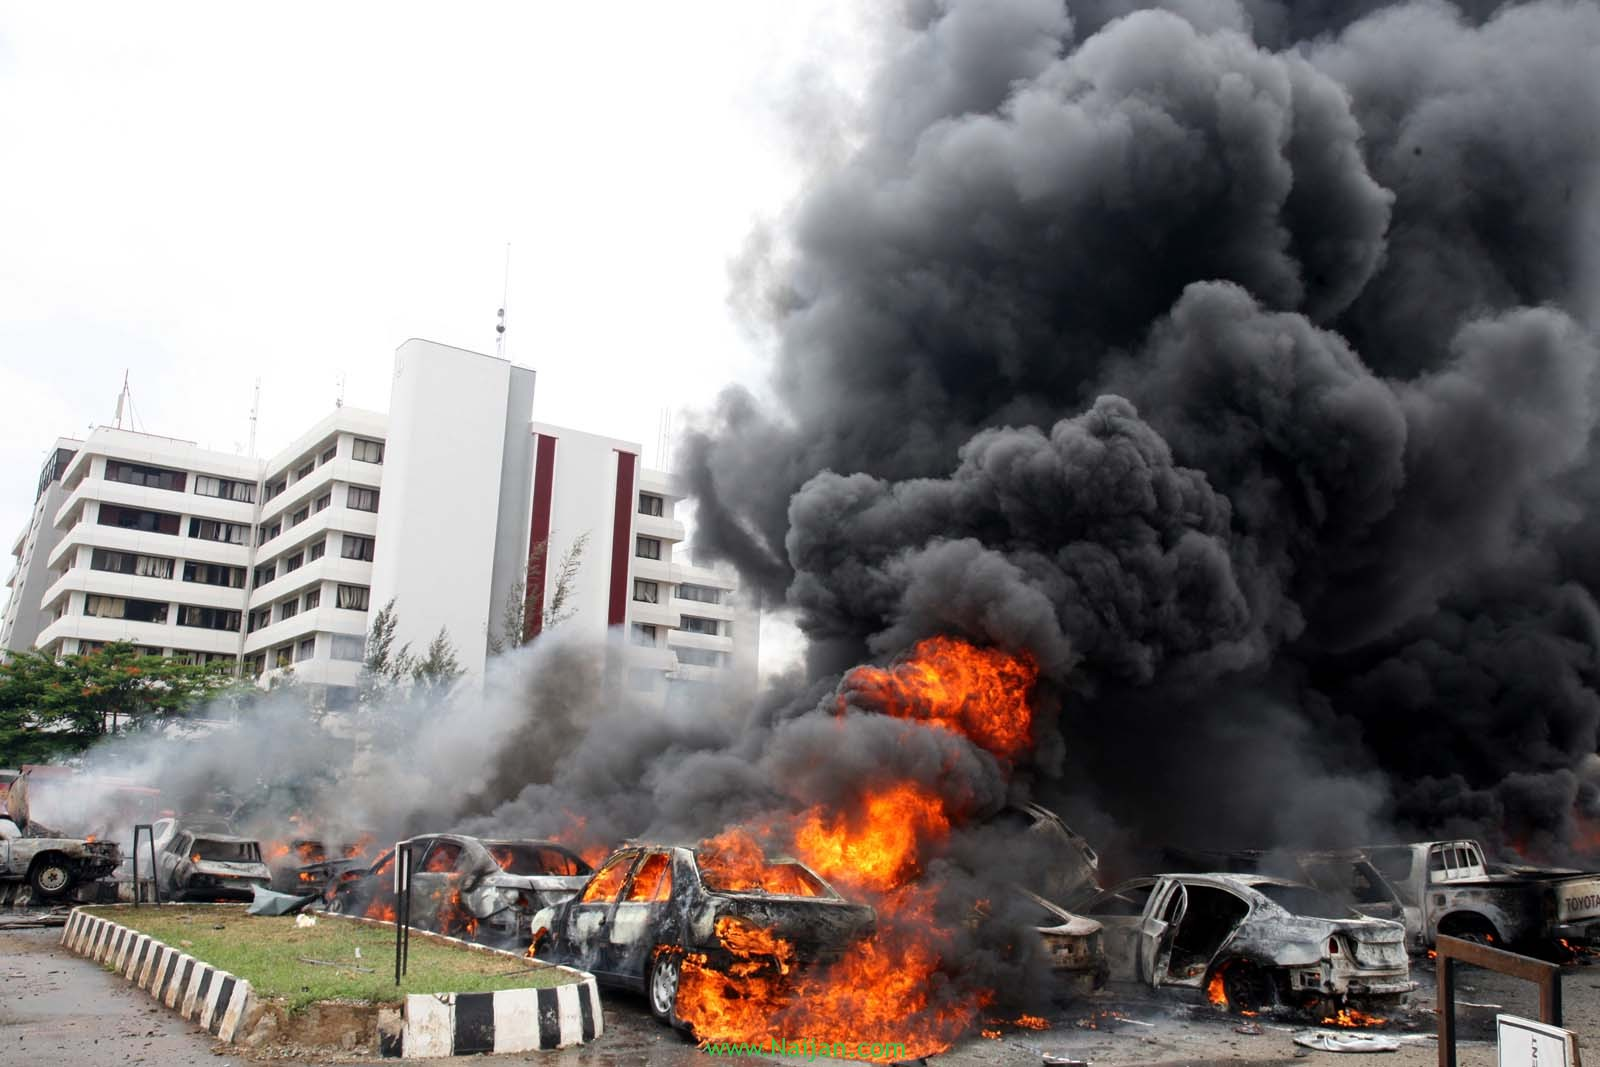 Terrorism in Nigeria: Enough!